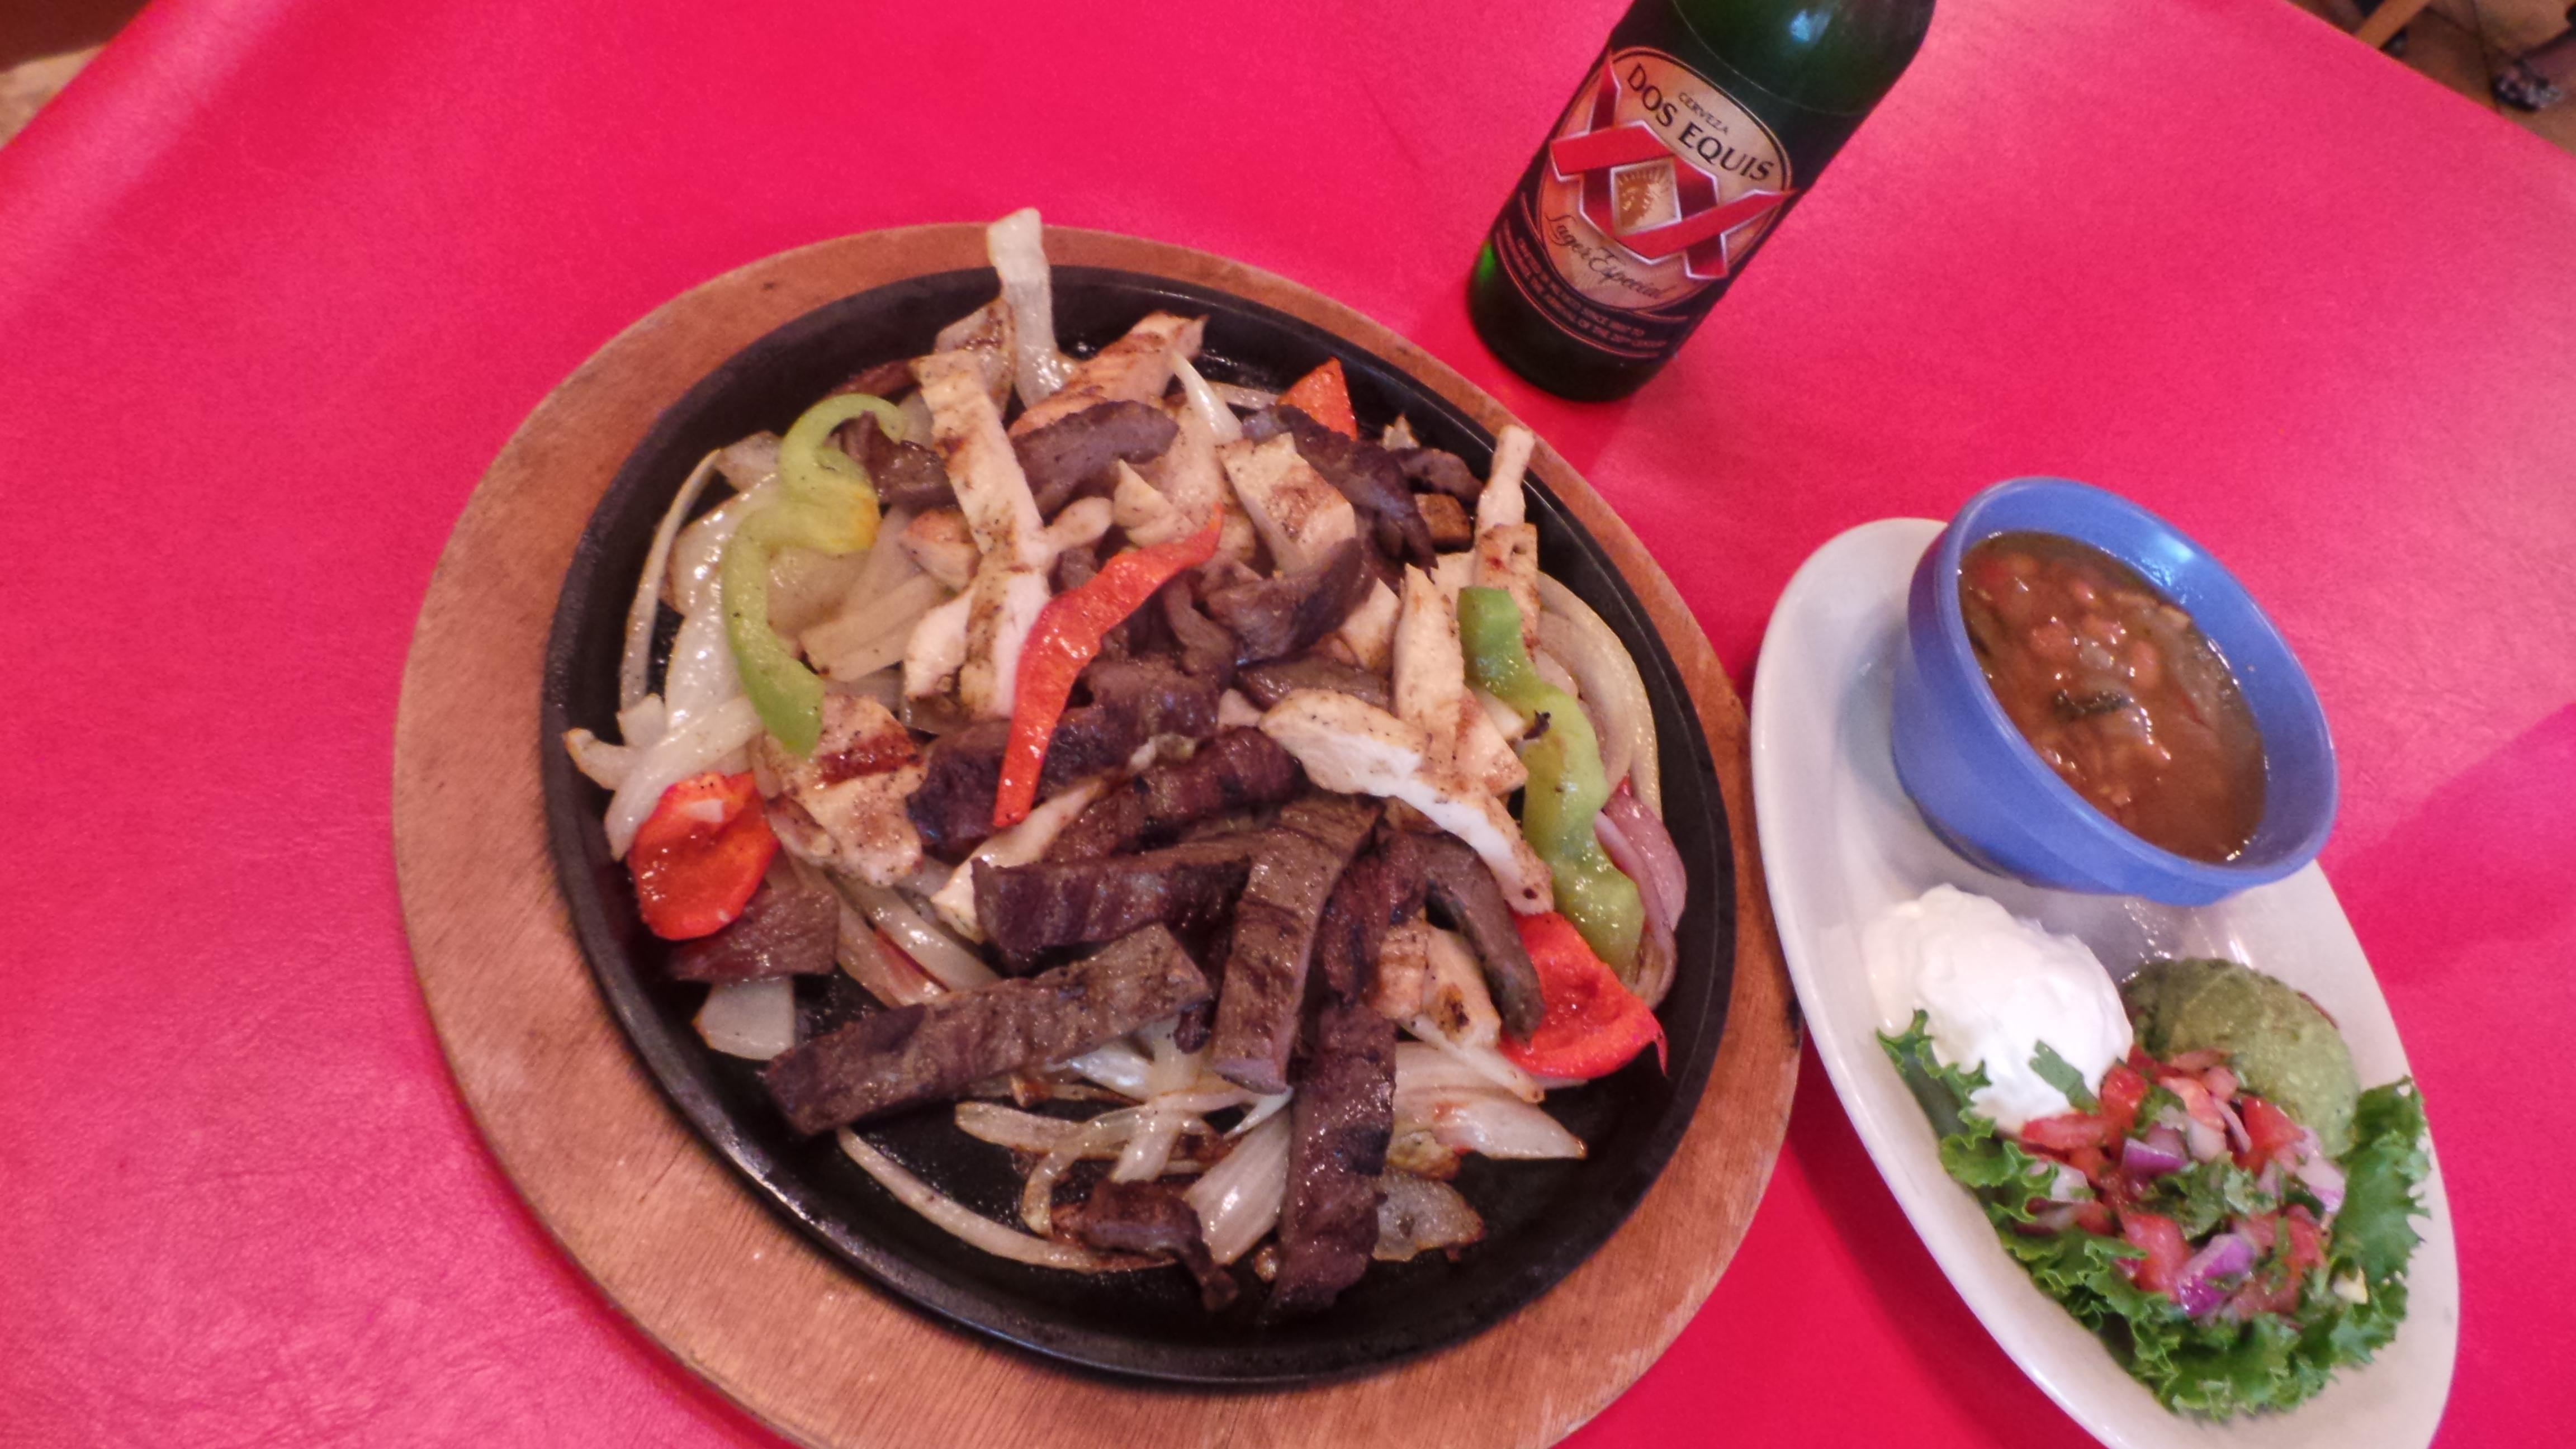 Sabor A La Mexicana Restaurant image 6